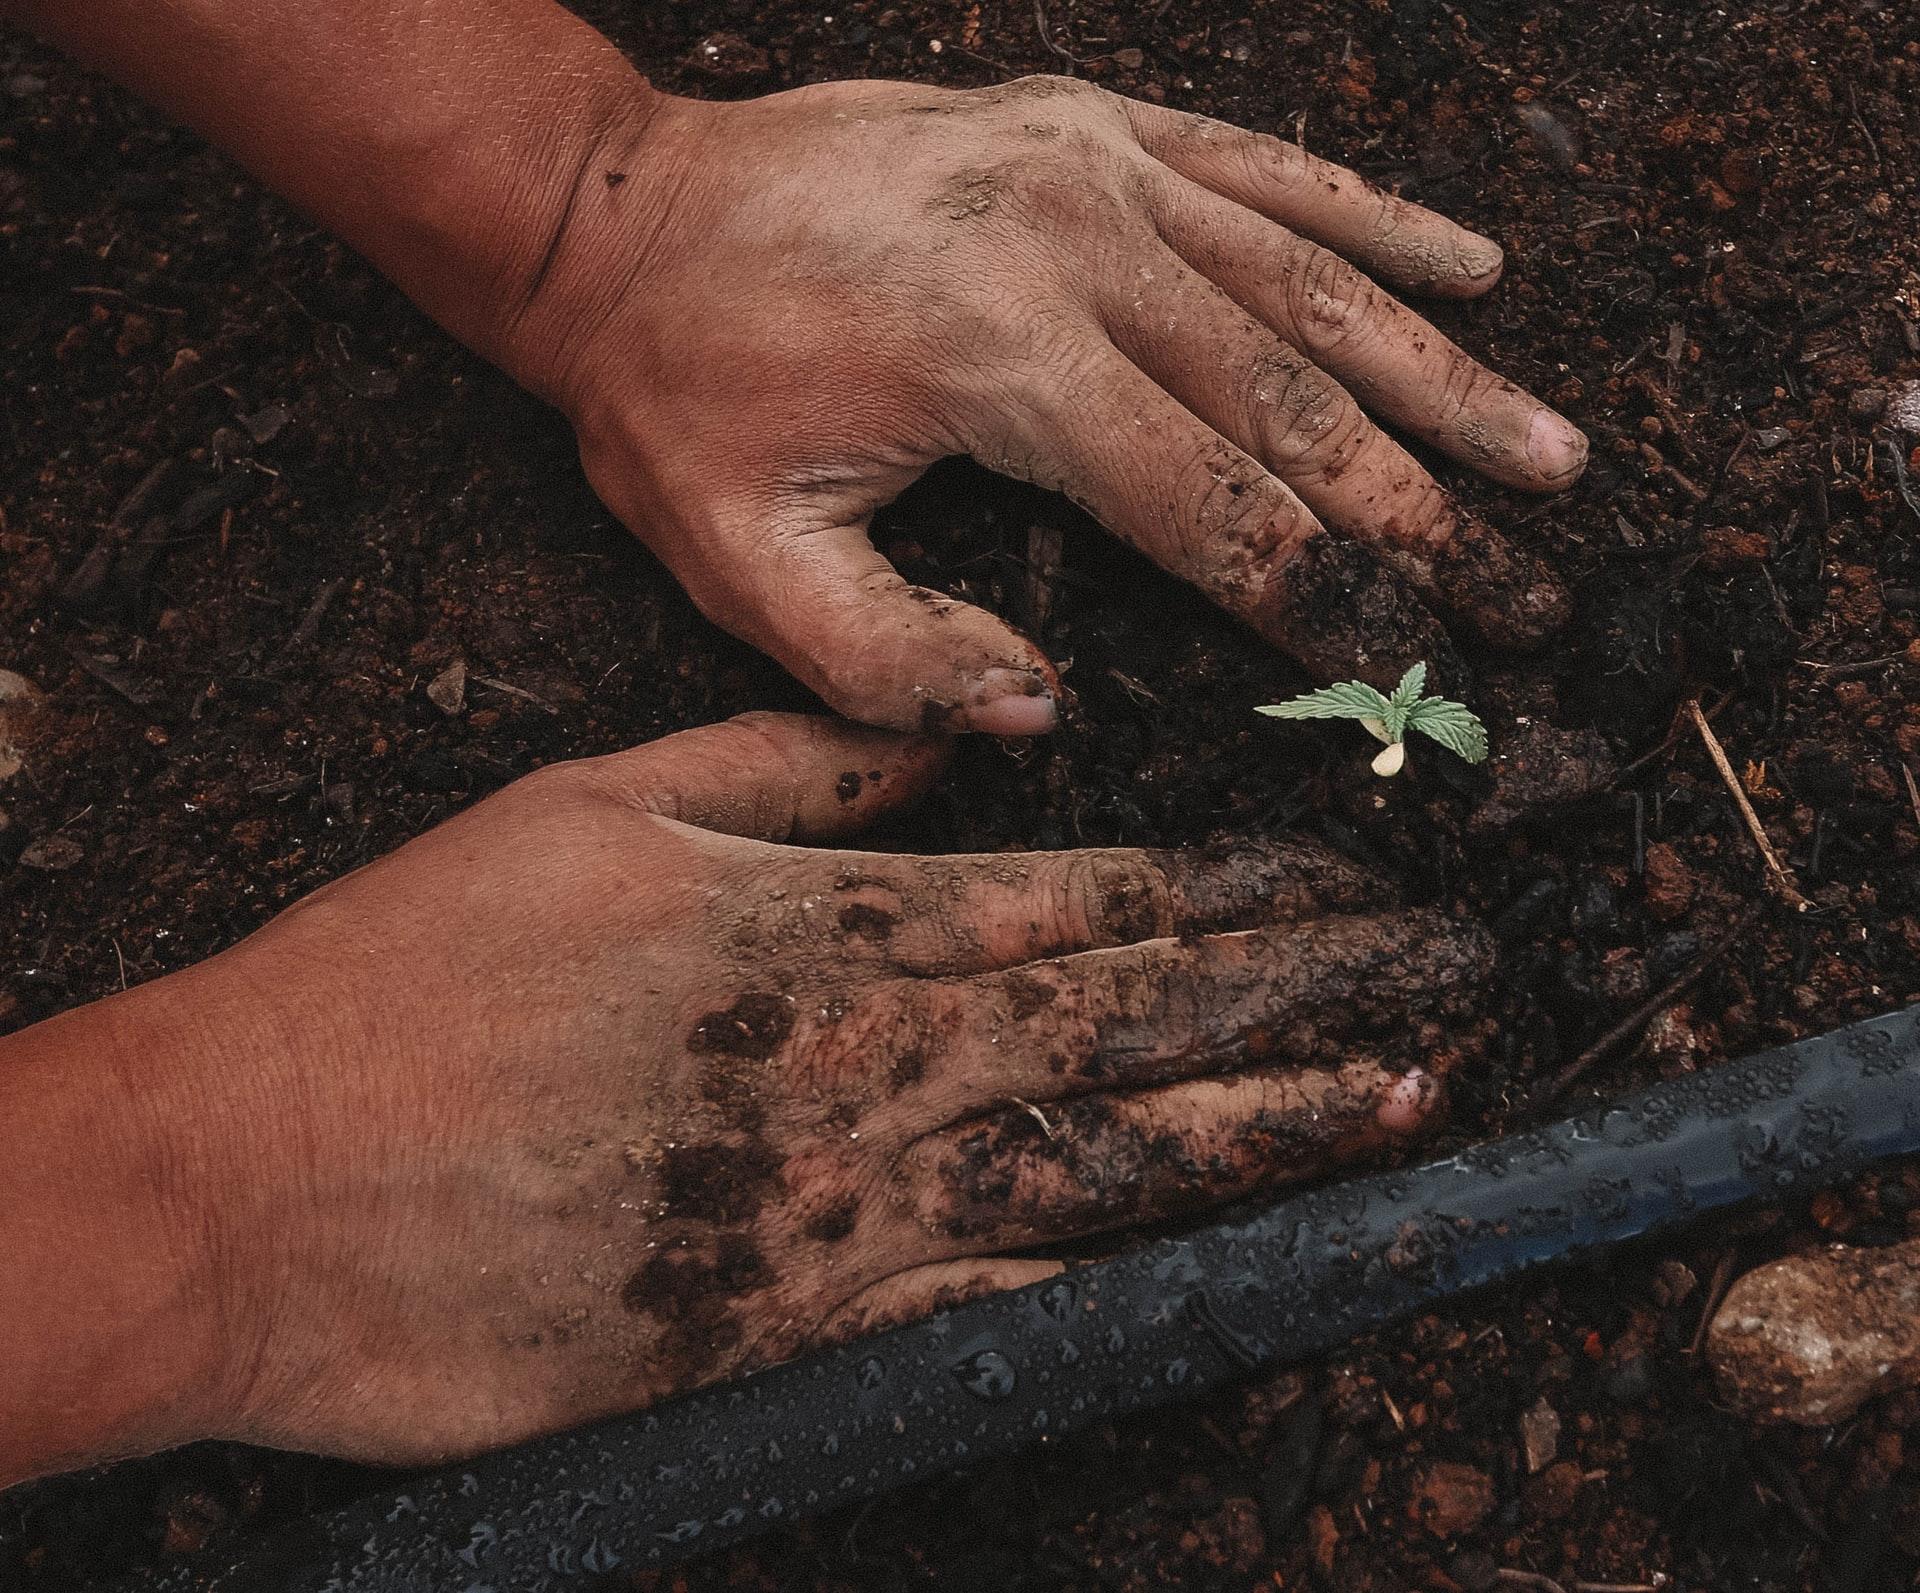 A man's hands seen planting in fresh soil